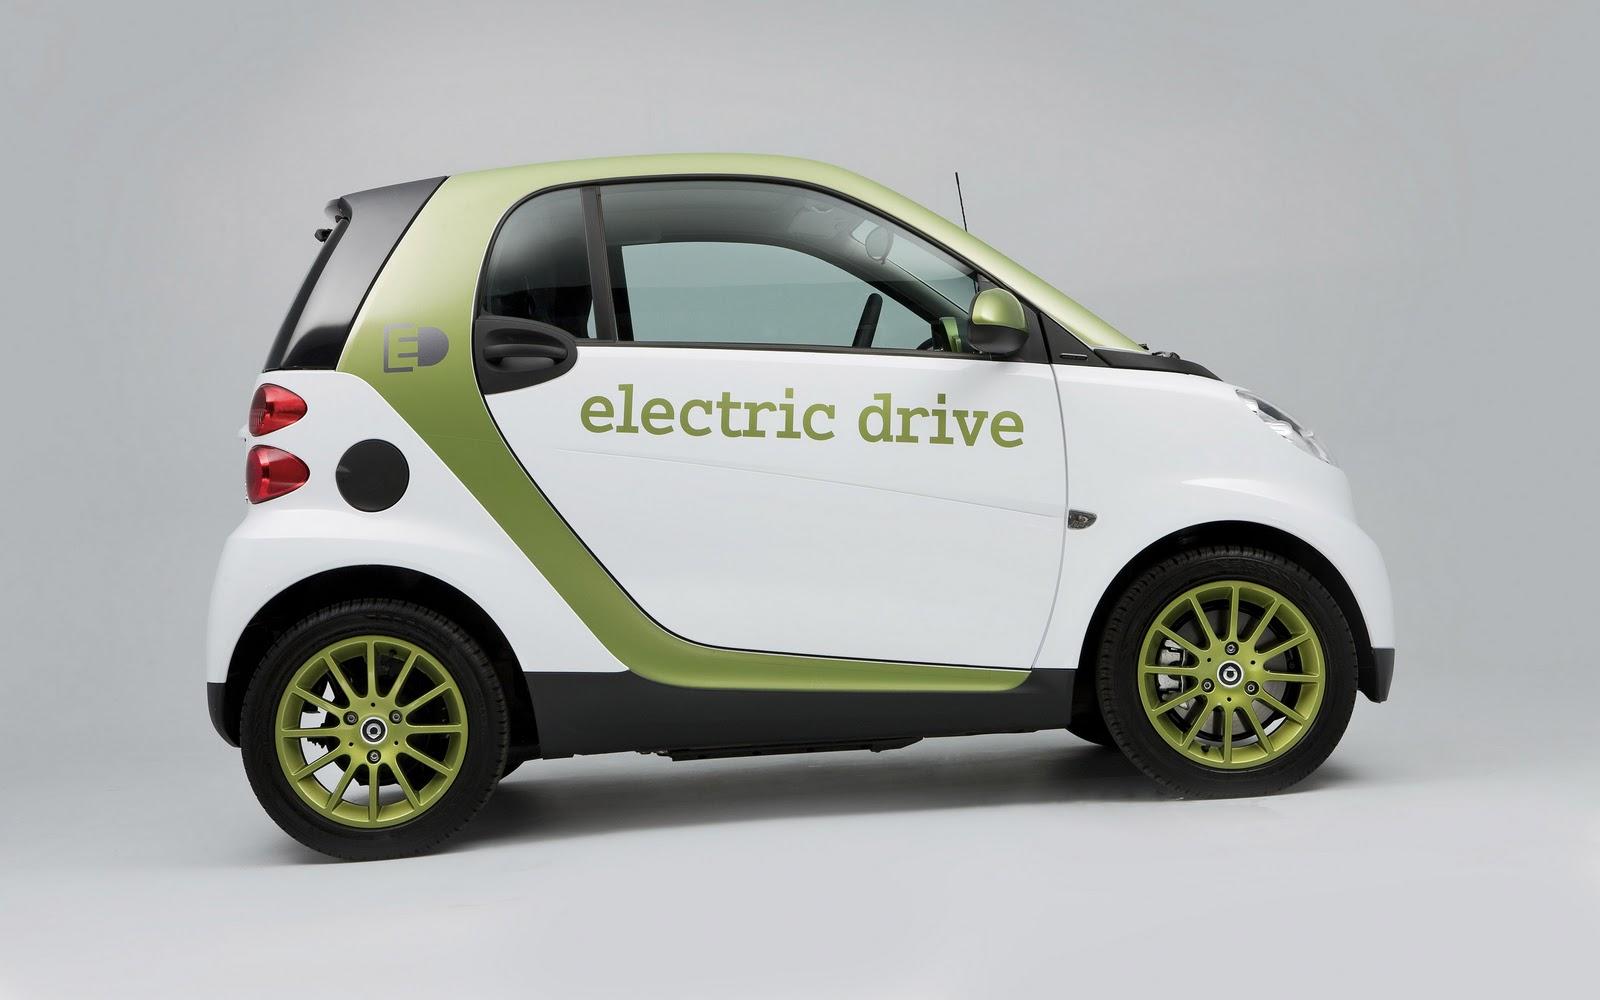 2012 mobil listrik smart fortwo dijual di indonesia tipe mobil. Black Bedroom Furniture Sets. Home Design Ideas